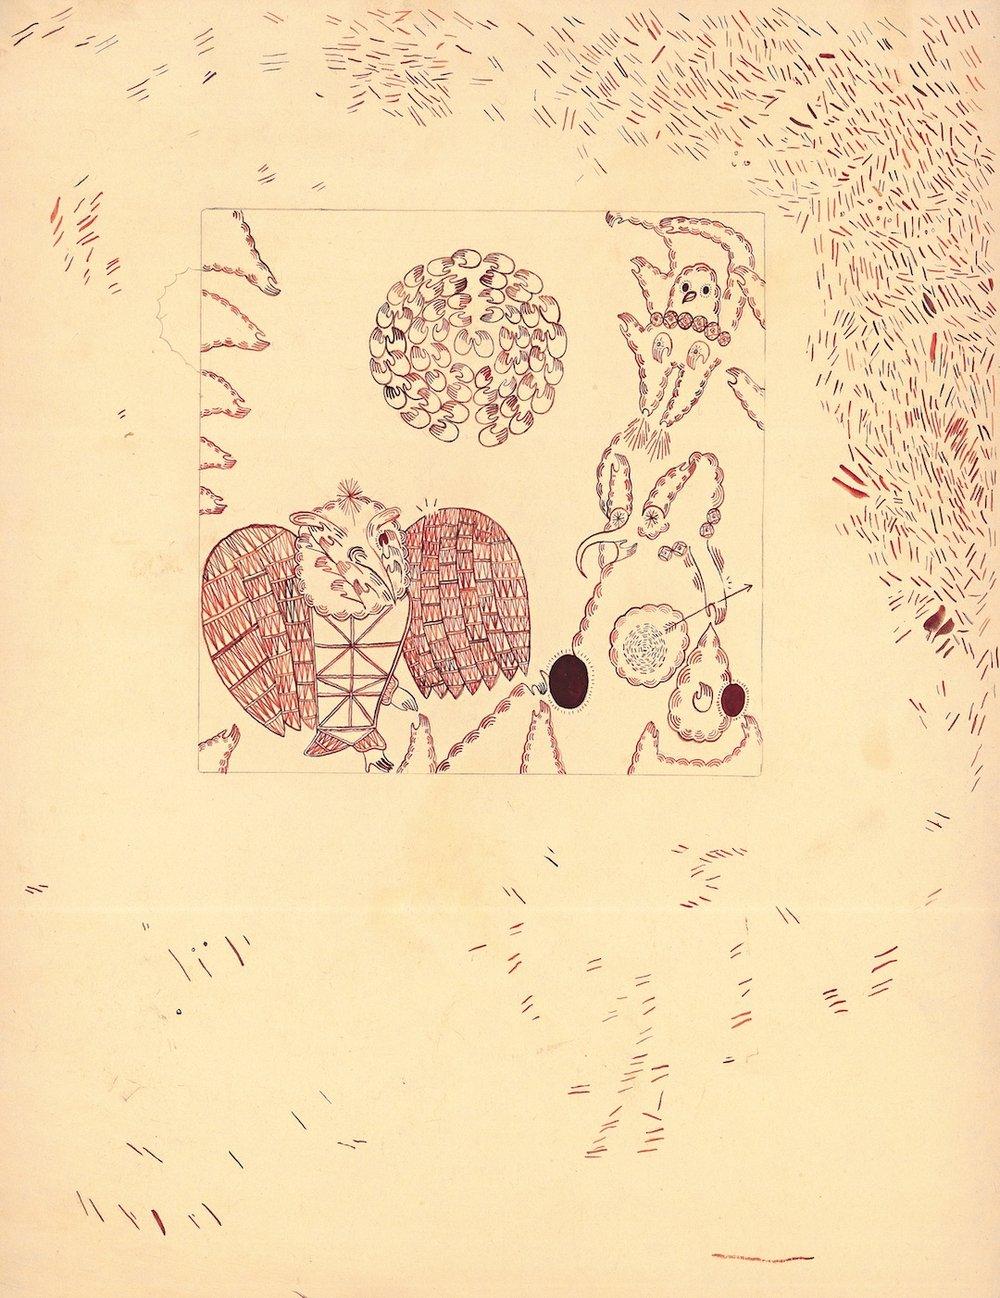 p.-65.jpg